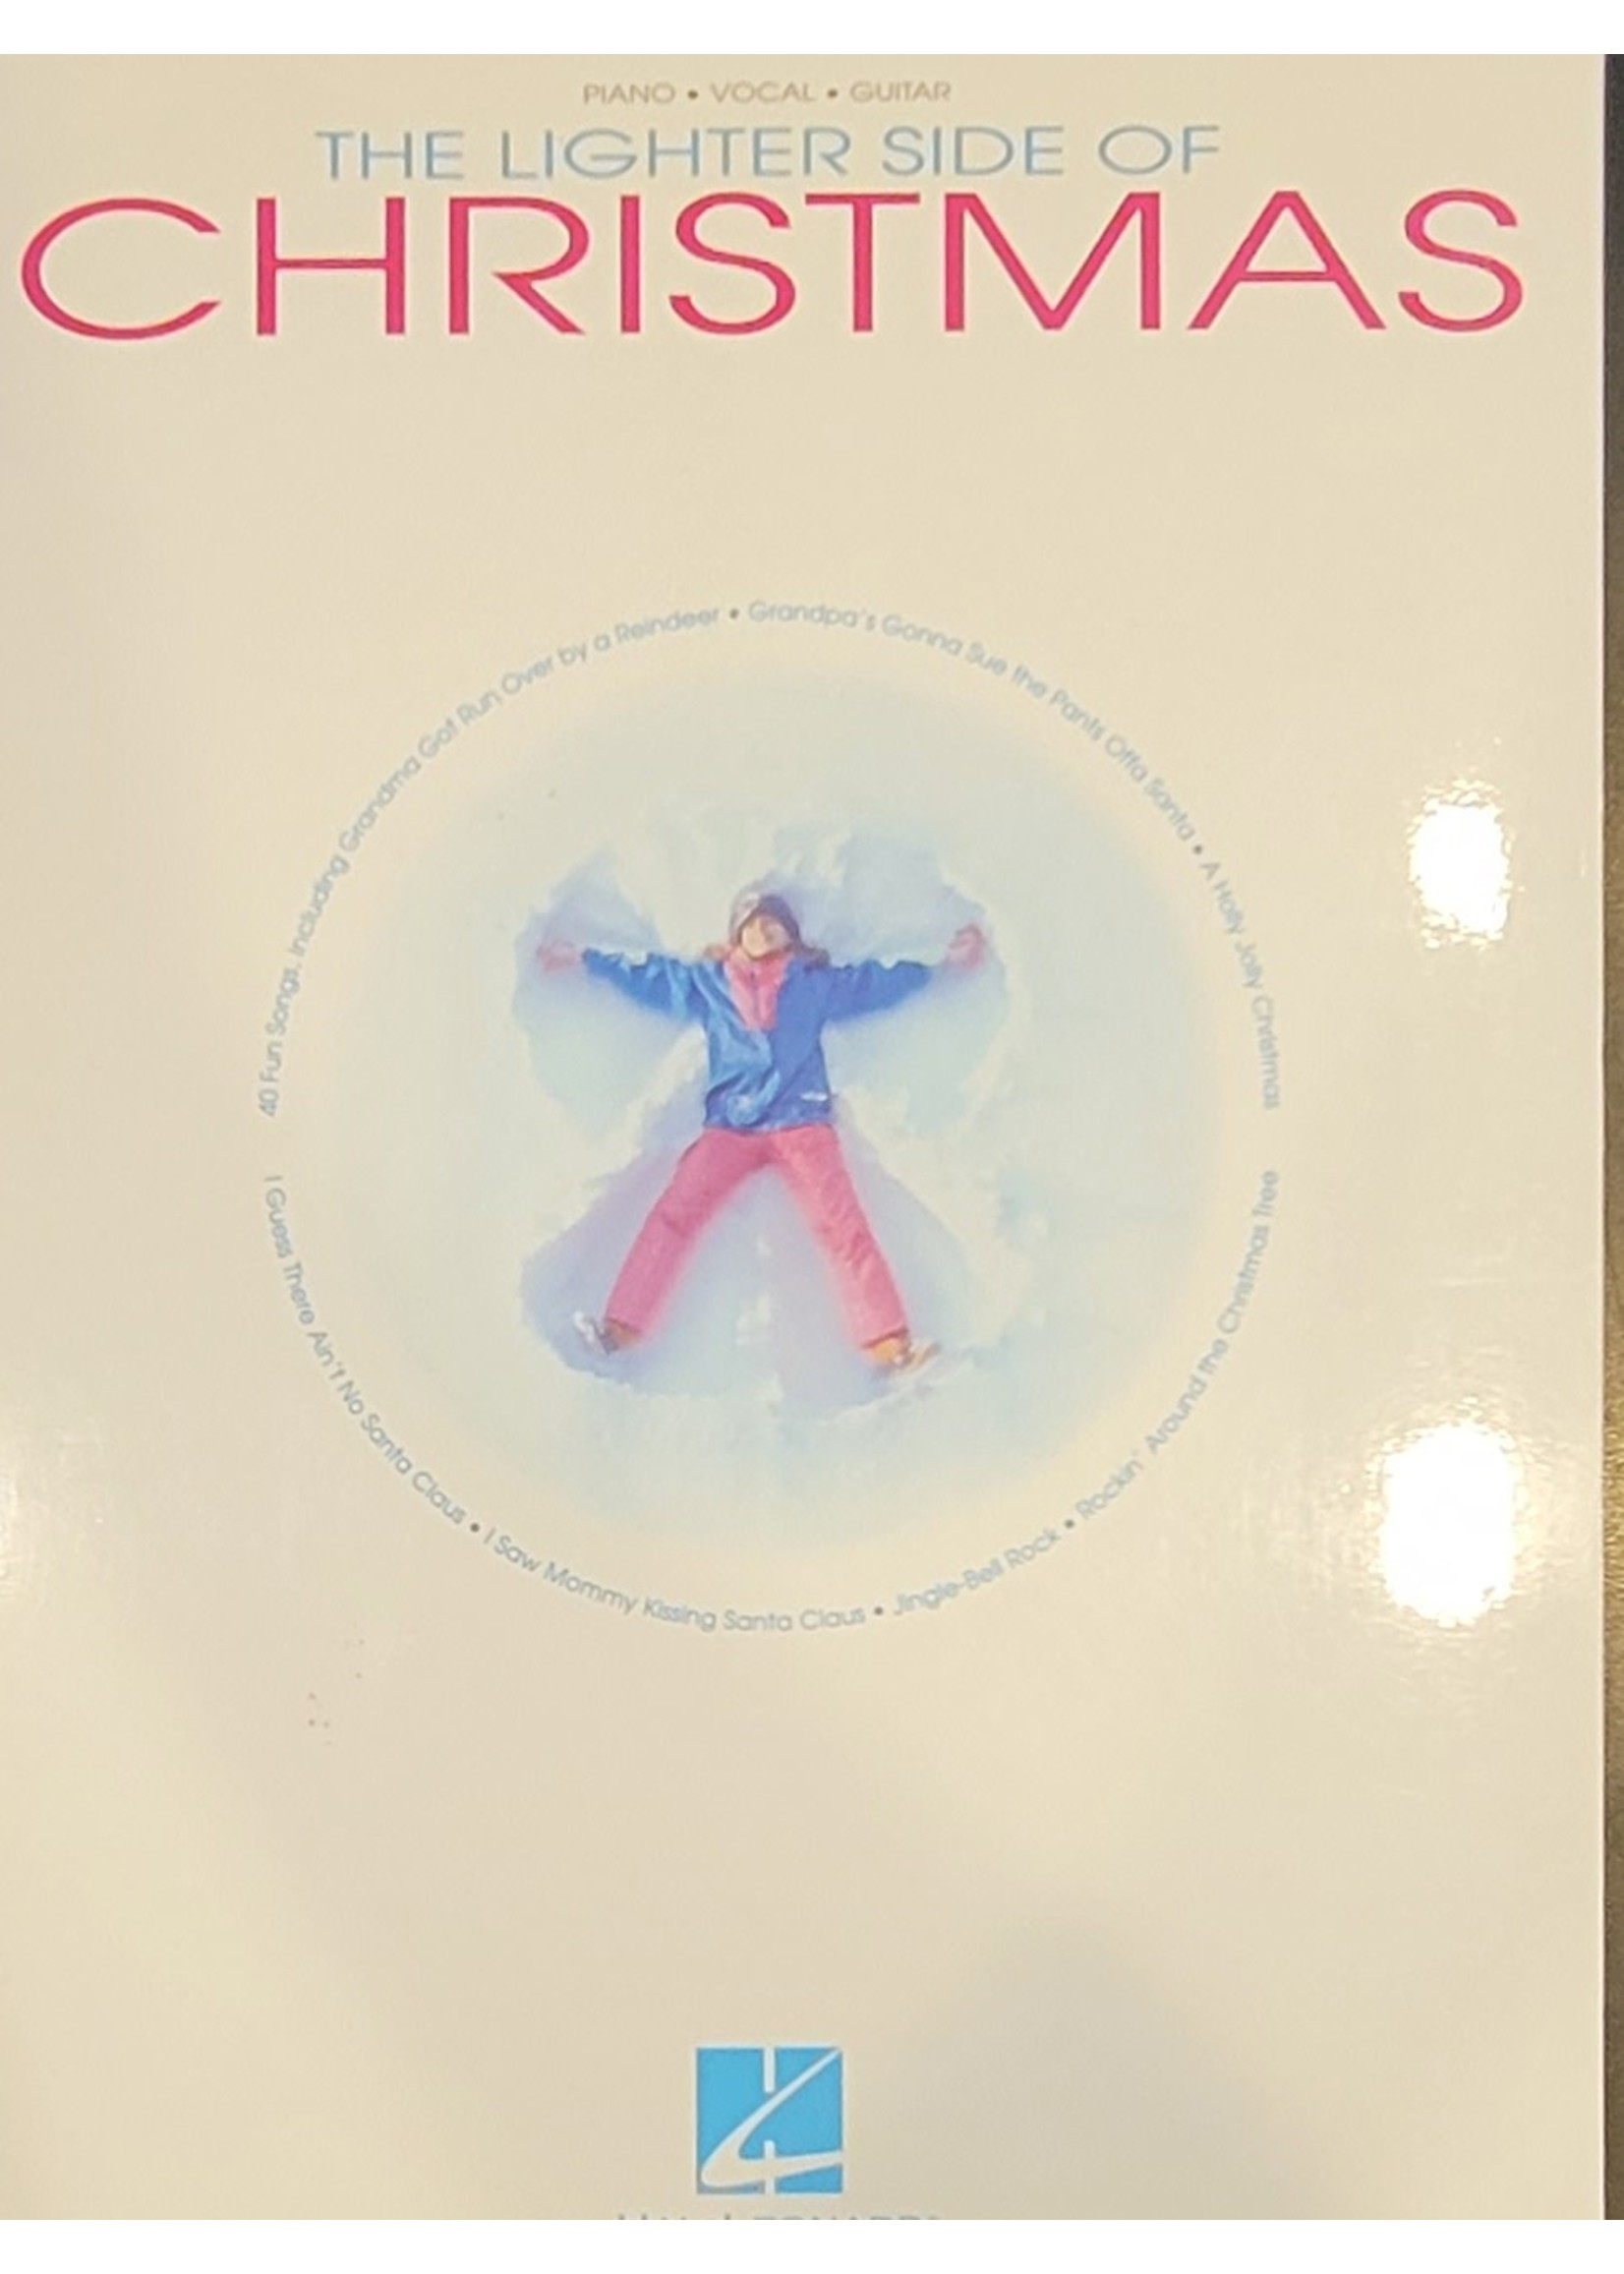 HAL LEONARD Copy of LIVRE LISTEN TO CHRISTMAS/PIANO